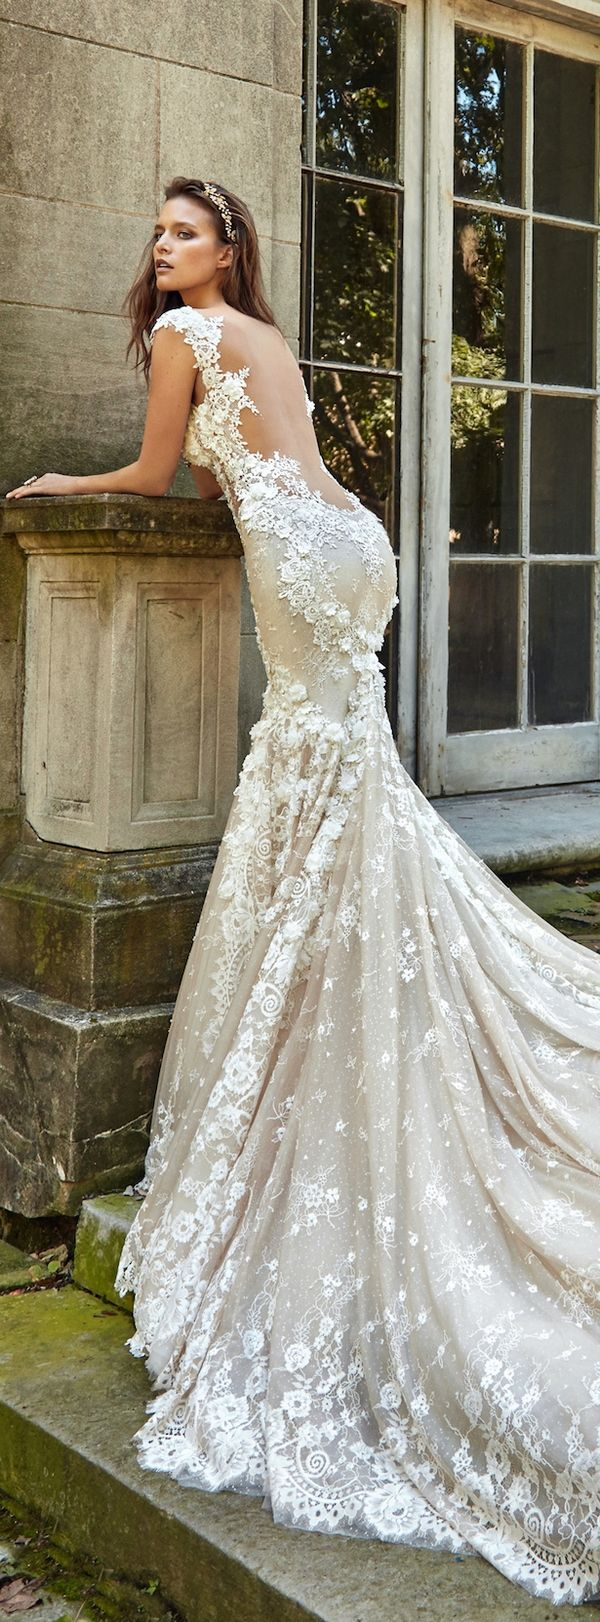 Galia Lahav 2017 Wedding Dresses / http://www.himisspuff.com/galia-lahav-fall-2017-wedding-dresses/2/